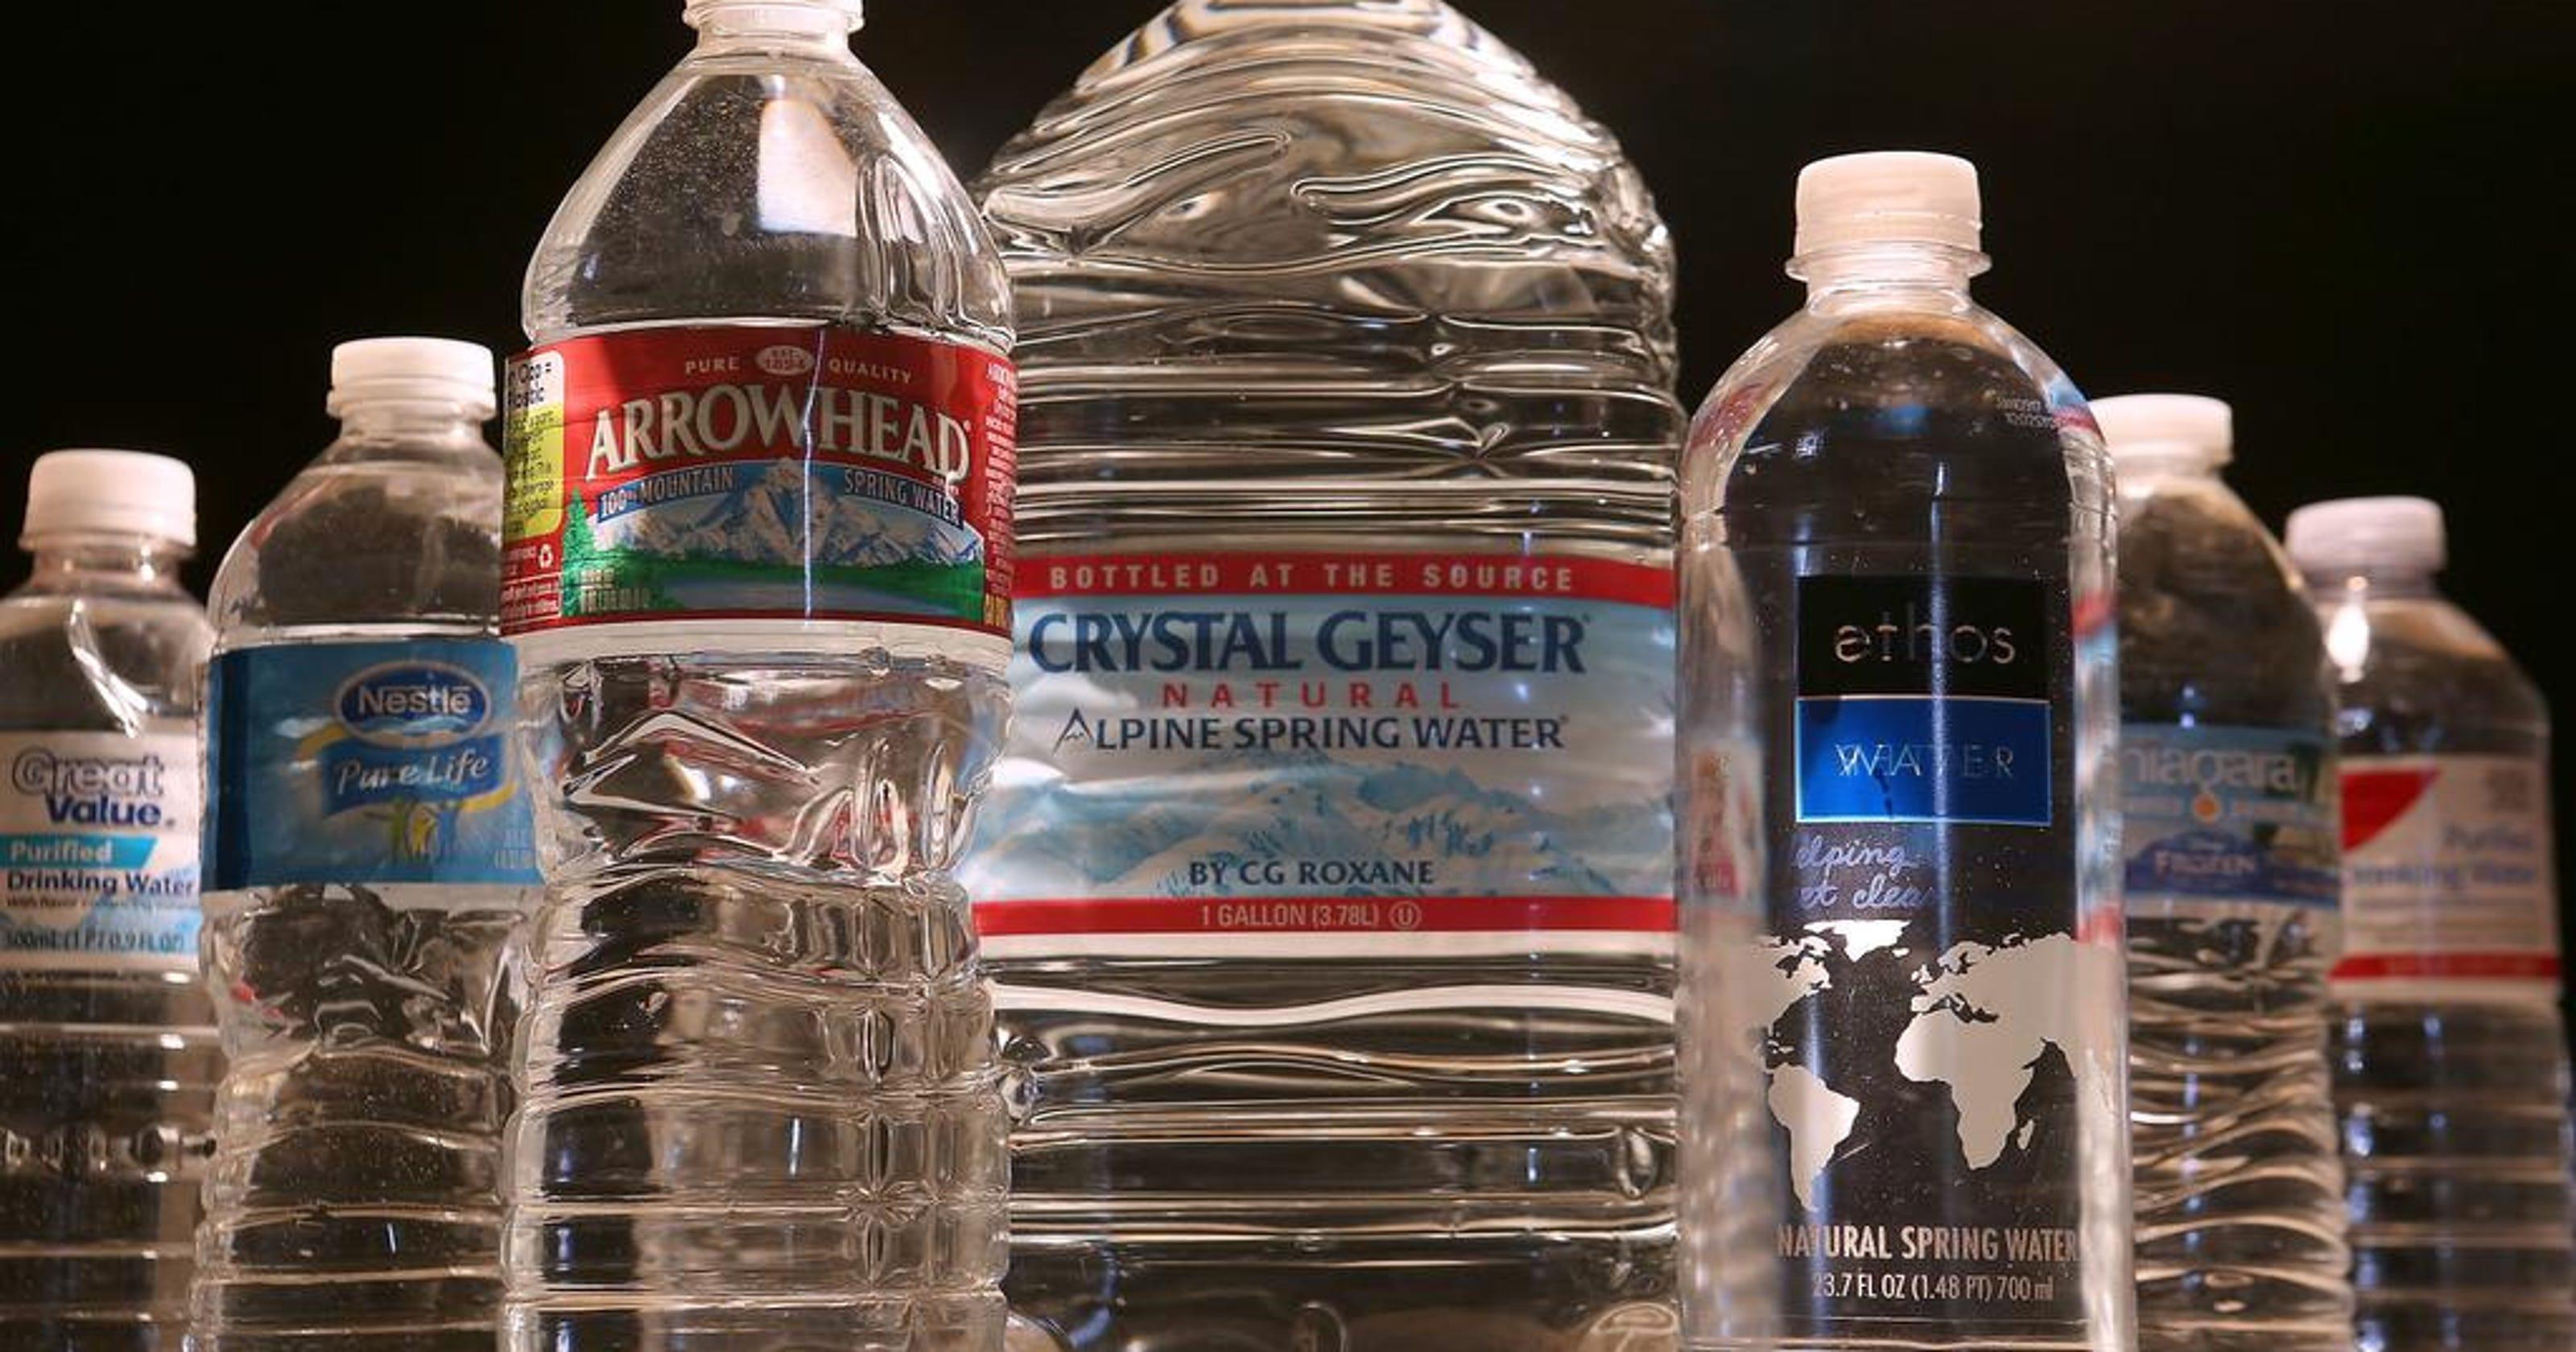 Crystal Geyser's secret arsenic disposal scheme revealed